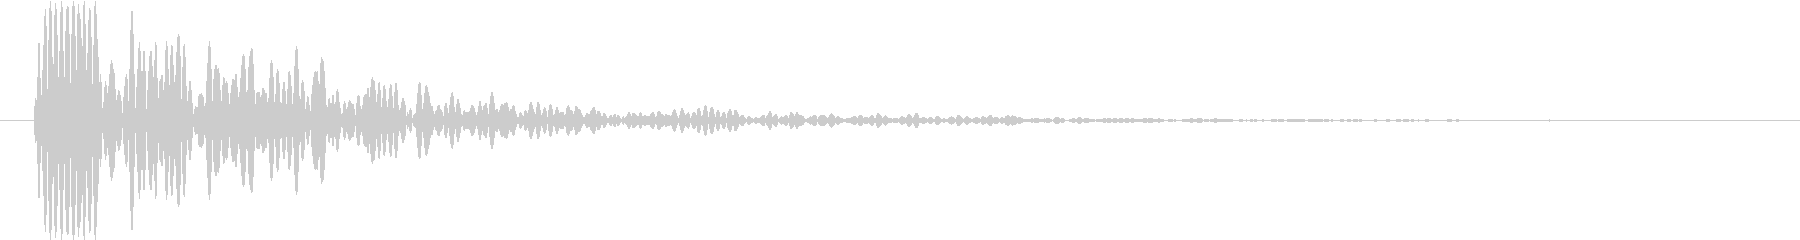 Knife 三徳包丁 トン 単発 2の未再生の波形